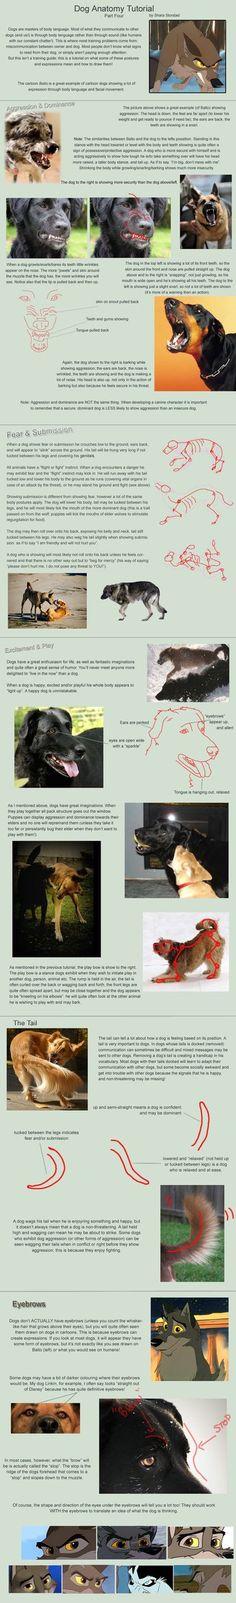 Dog Anatomy Tutorial 4 by ~SleepingDeadGirl on deviantART